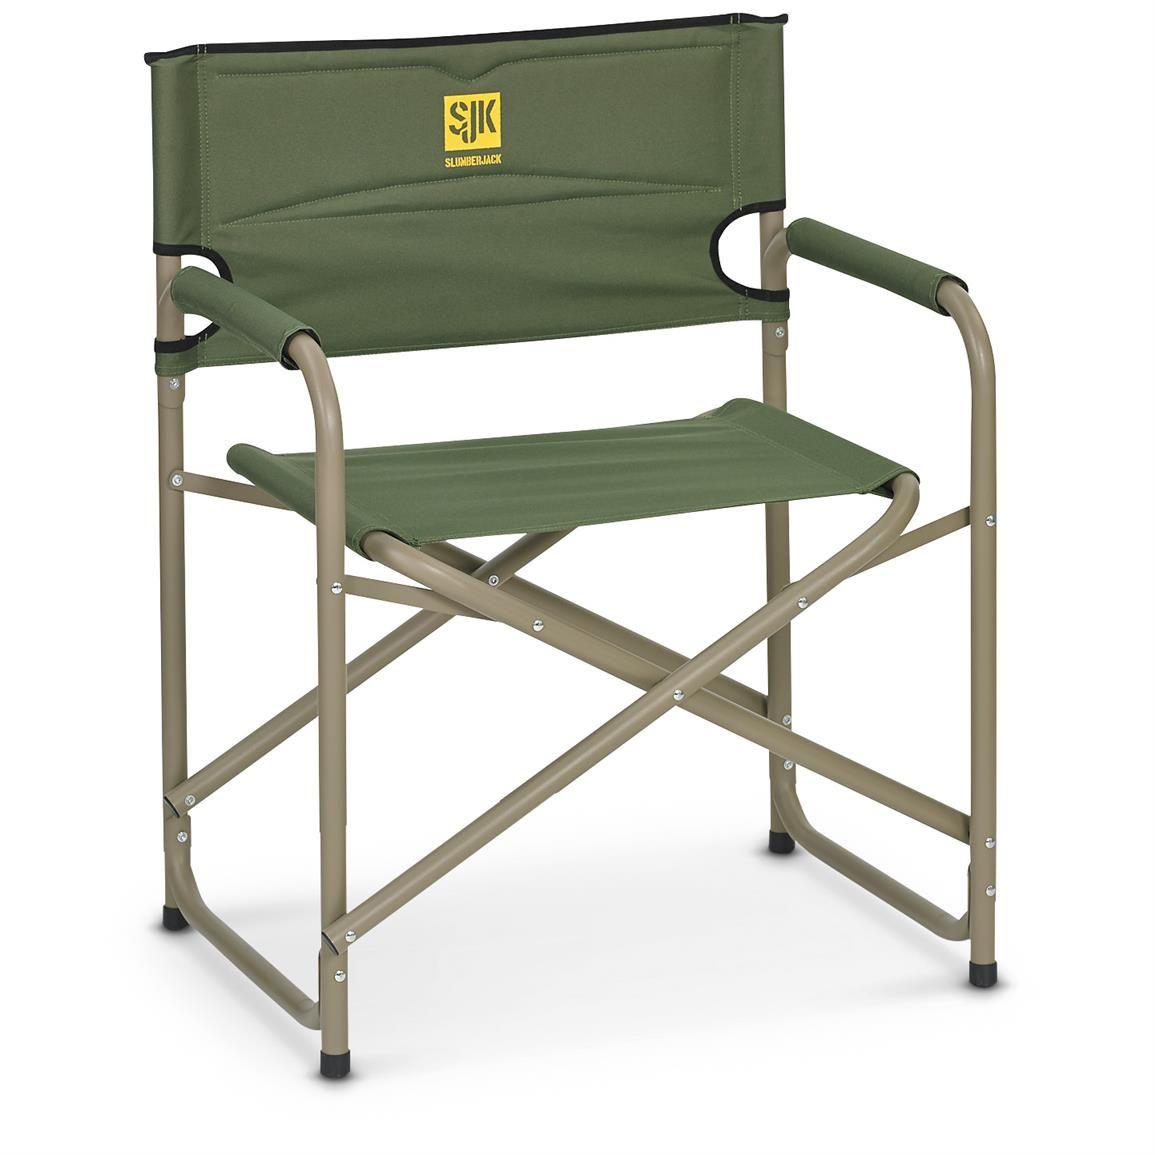 Slumberjack big steel chair lb capacity camping pinterest